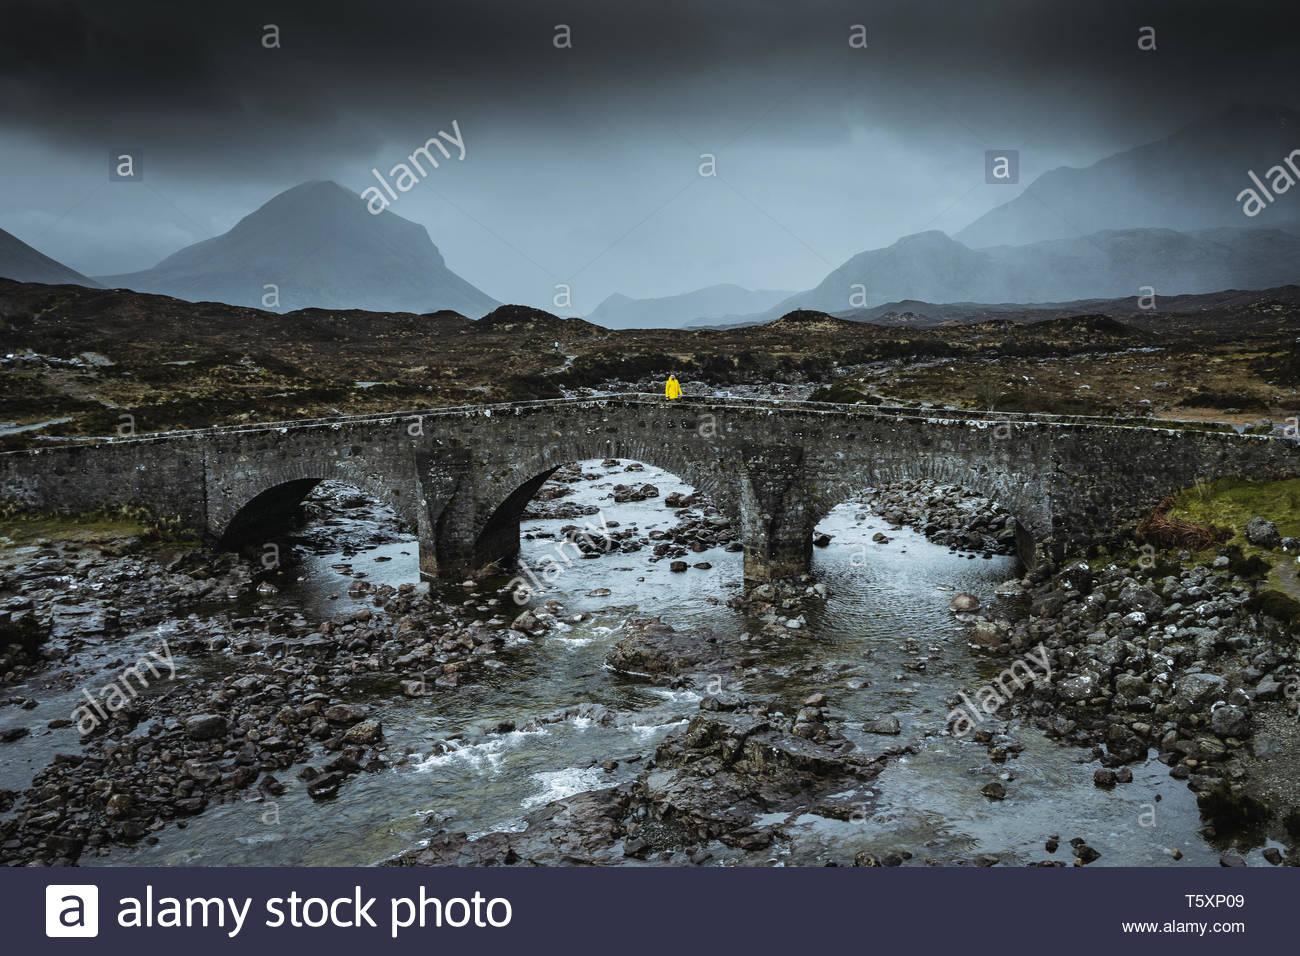 Sligachan Old Bridge in Scozia Immagini Stock